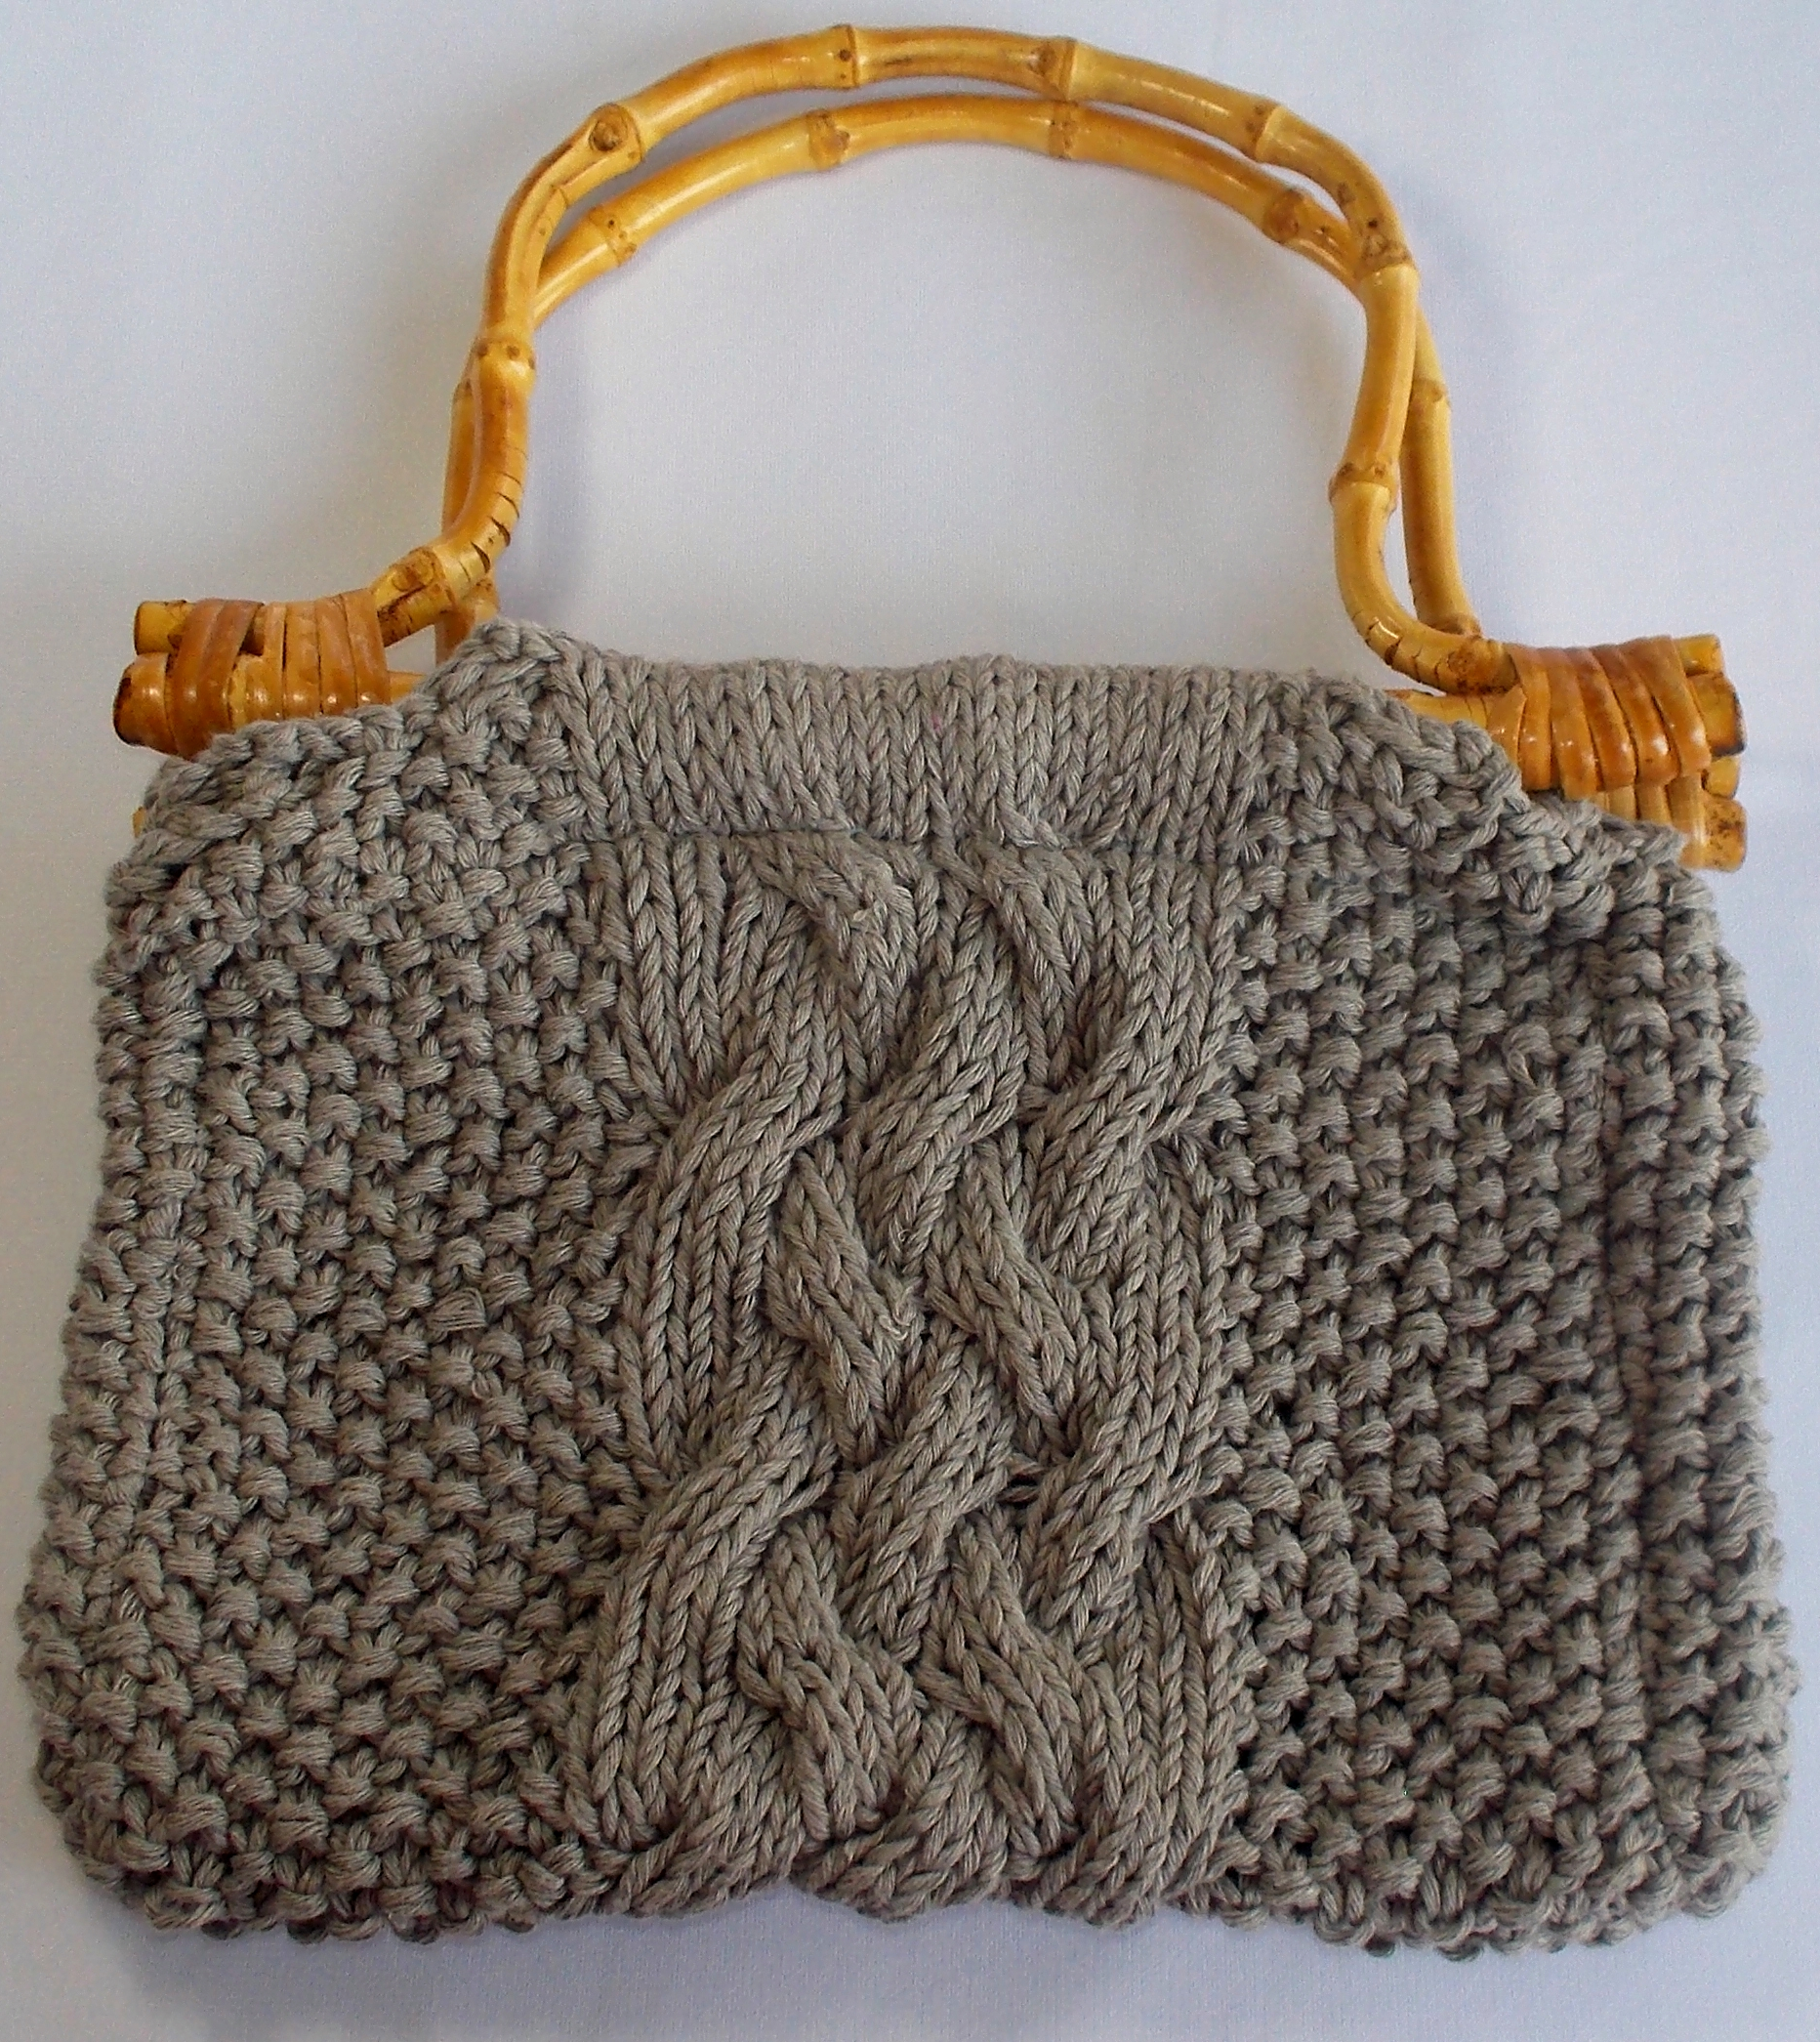 24c4e90fe9d Πλεκτή τσάντα με καλοκαιρινό νήμα | Χειροποίητες δημιουργίες στη ...